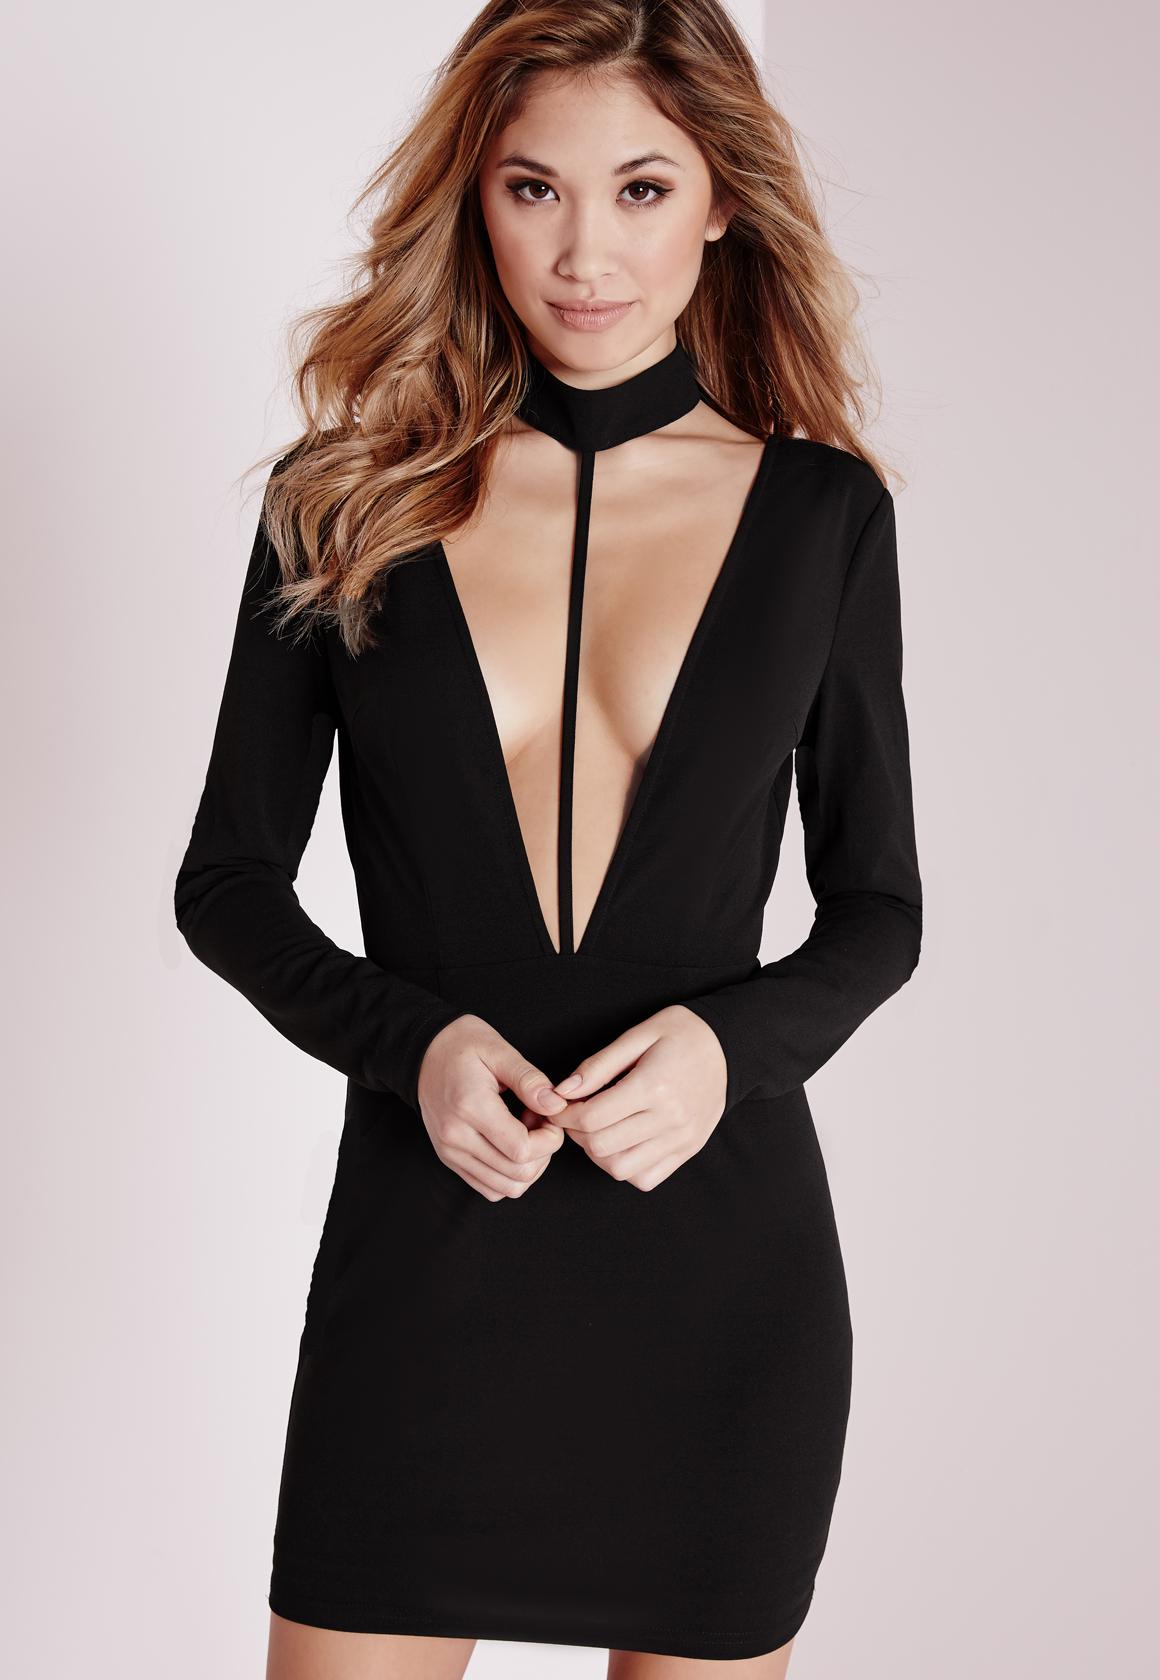 Lyst - Missguided Crepe Choker Long Sleeve Bodycon Dress Black in Black 7f75b6d49